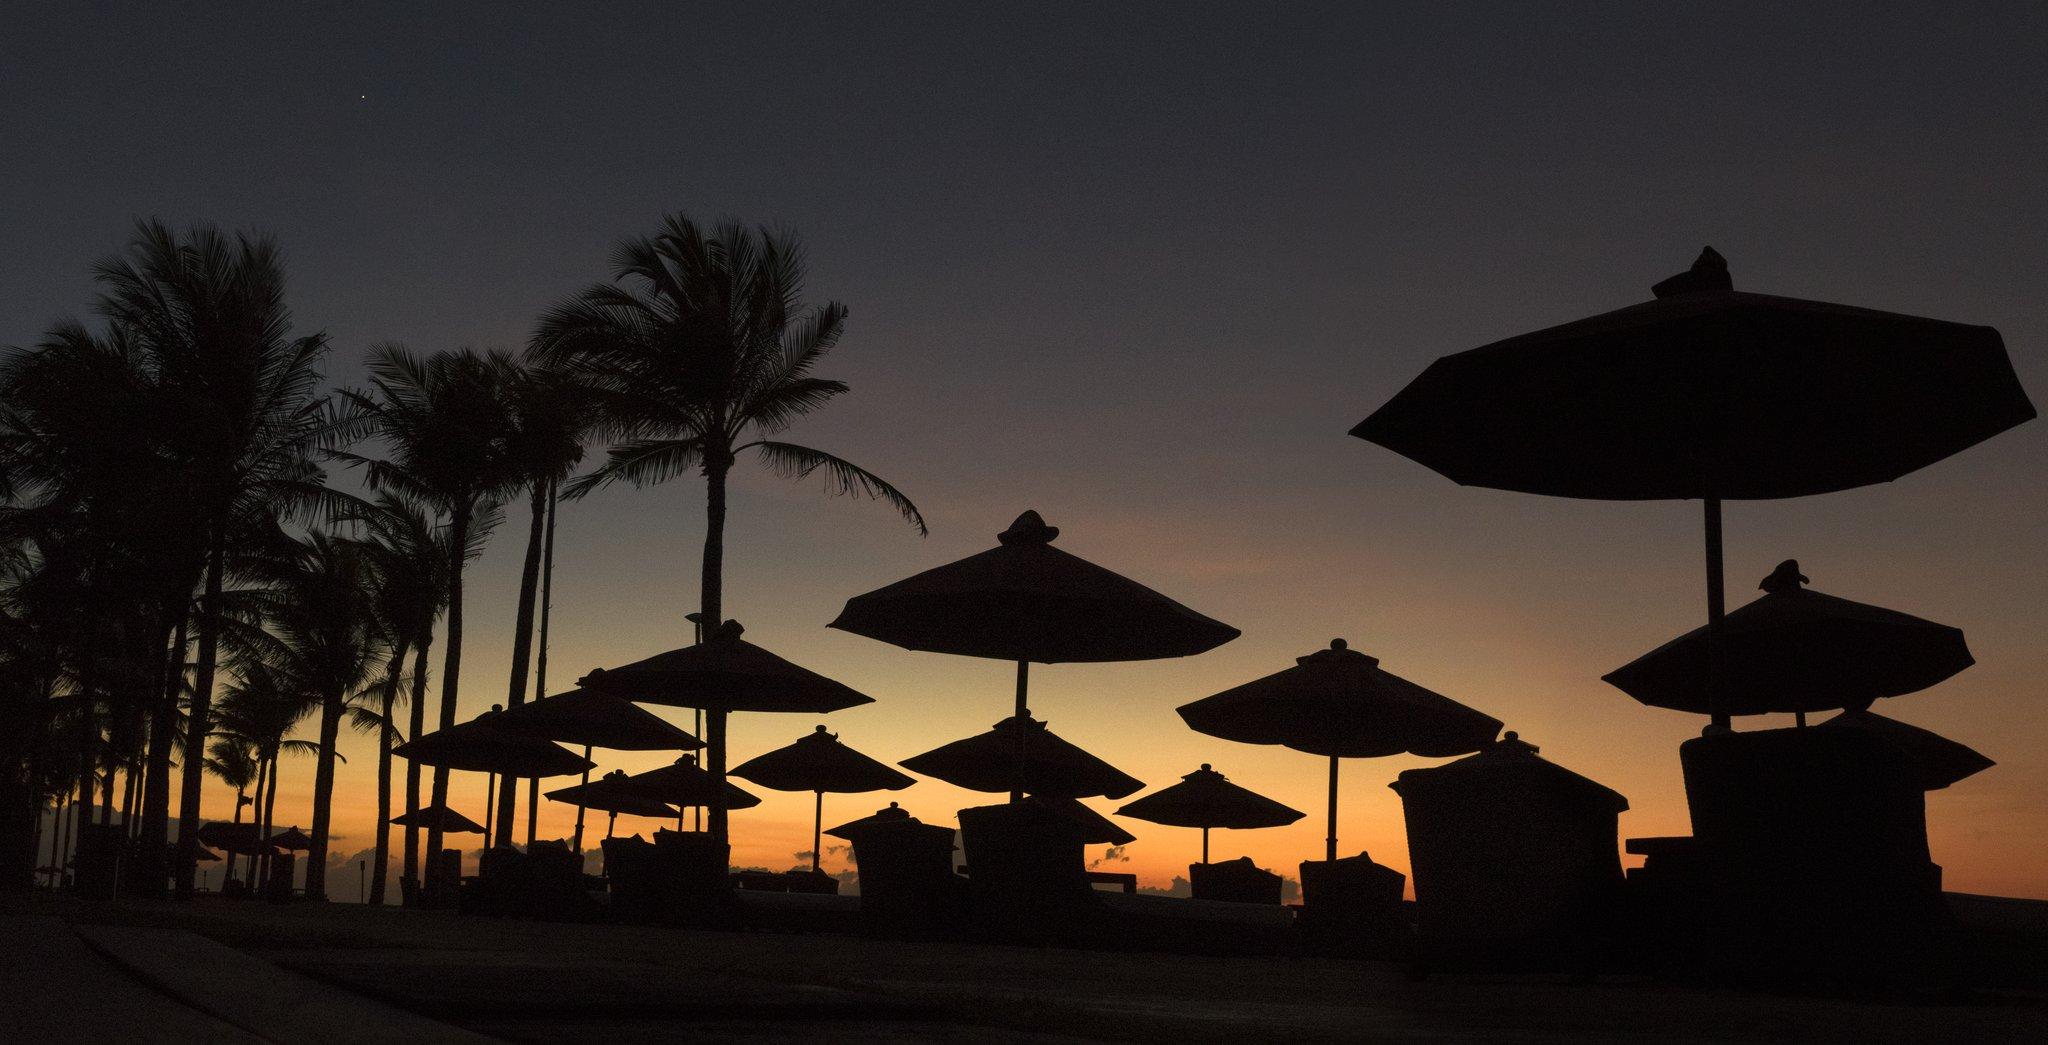 The St Regis Bali Resort Deluxe Nusa Dua Indonesia Hotels Gds Voucher Hotel Park Kuta Reservation Codes Travel Weekly